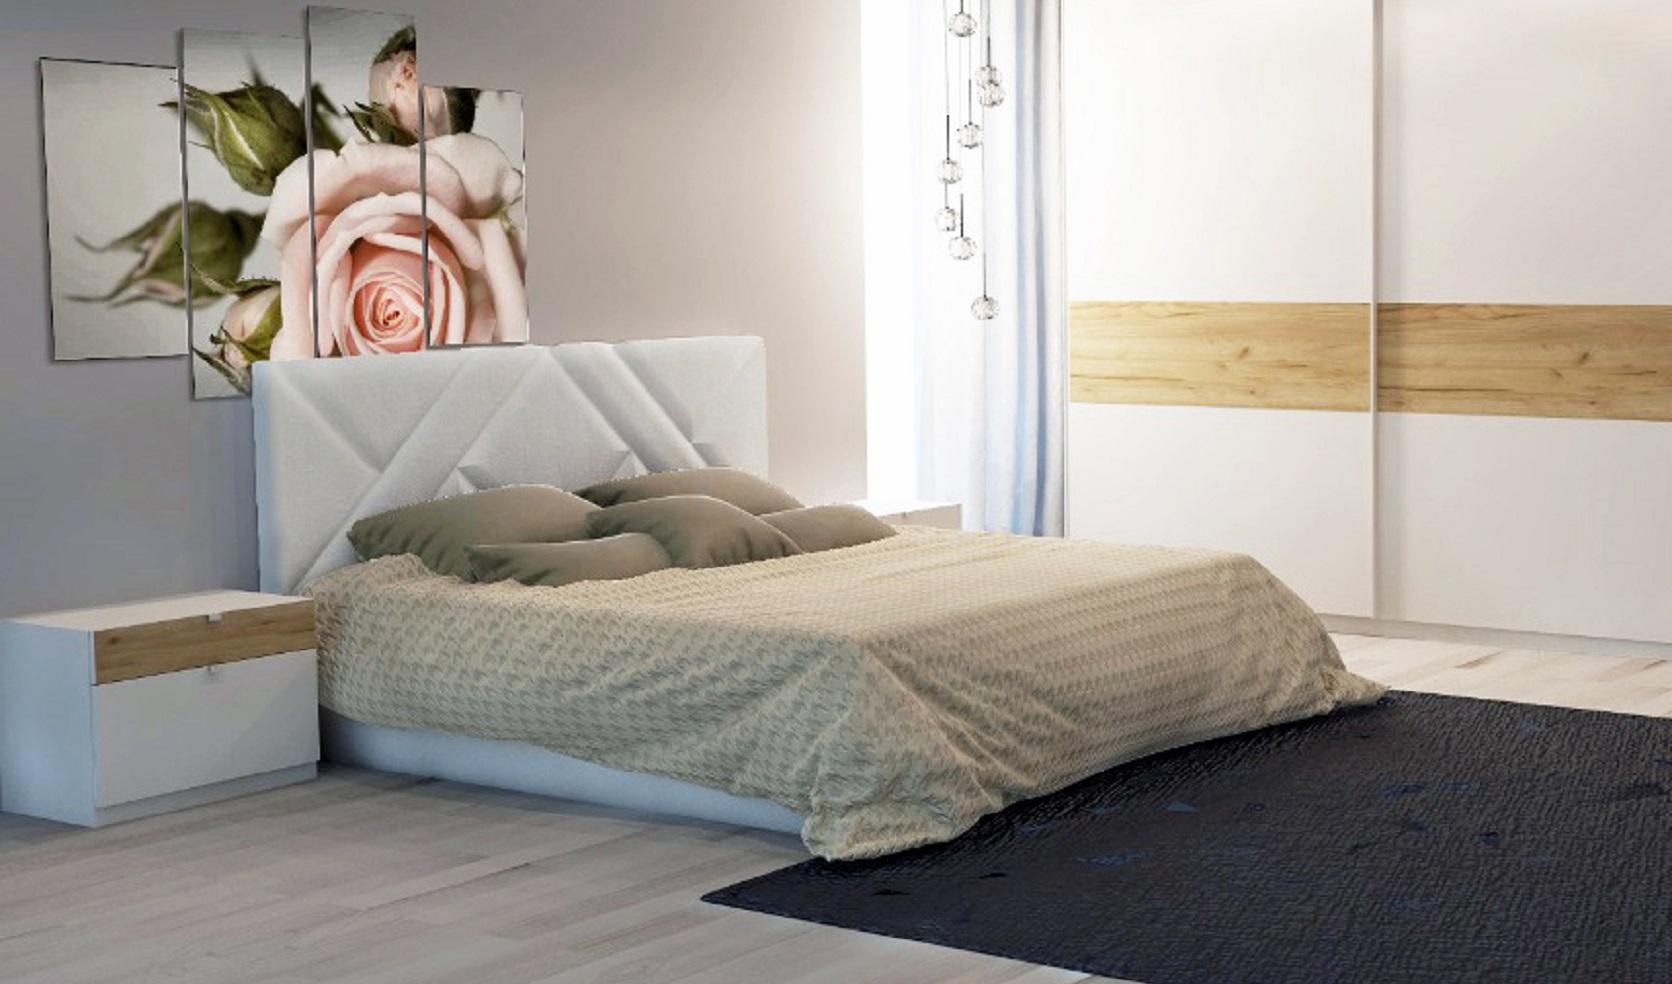 Full Size of Bett Modern Beyond Better Sleep Pillow Holz Design Eiche Betten 120x200 Kaufen 180x200 Leader 140x200 Italienisches Puristisch 5c3d15d6a3c25 Halbhohes Günstig Wohnzimmer Bett Modern